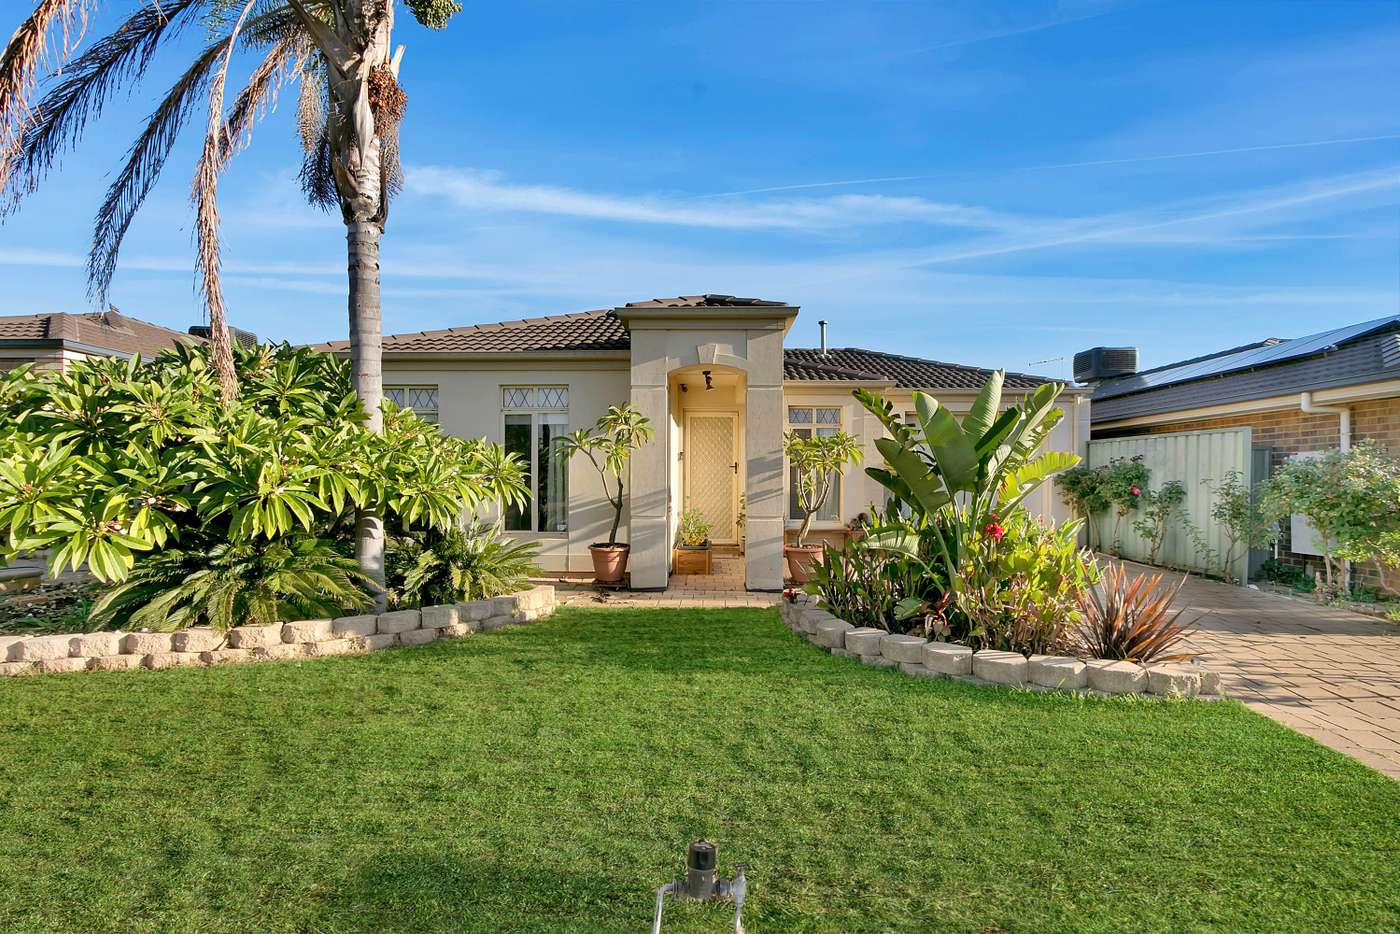 Main view of Homely house listing, 8 McPherson Grove, Davoren Park SA 5113